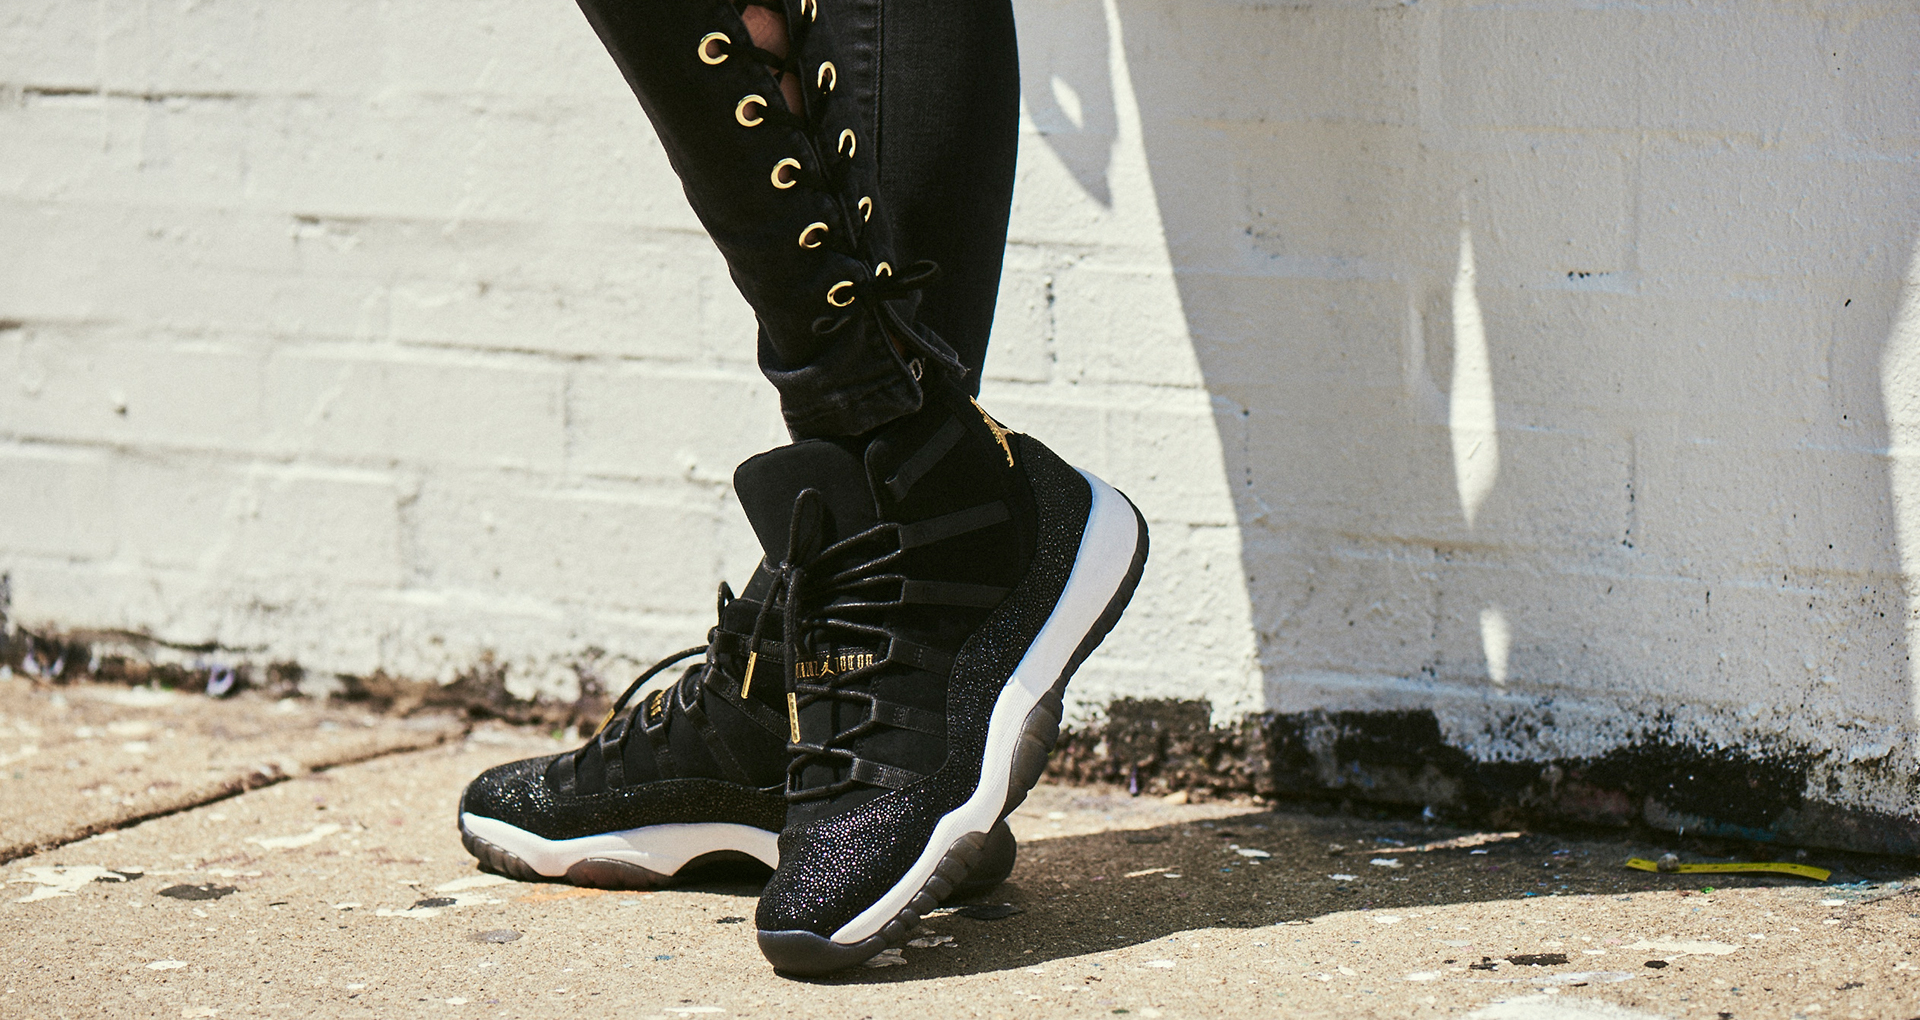 plus de photos e8d99 ca9d2 Basket Air Jordan 11